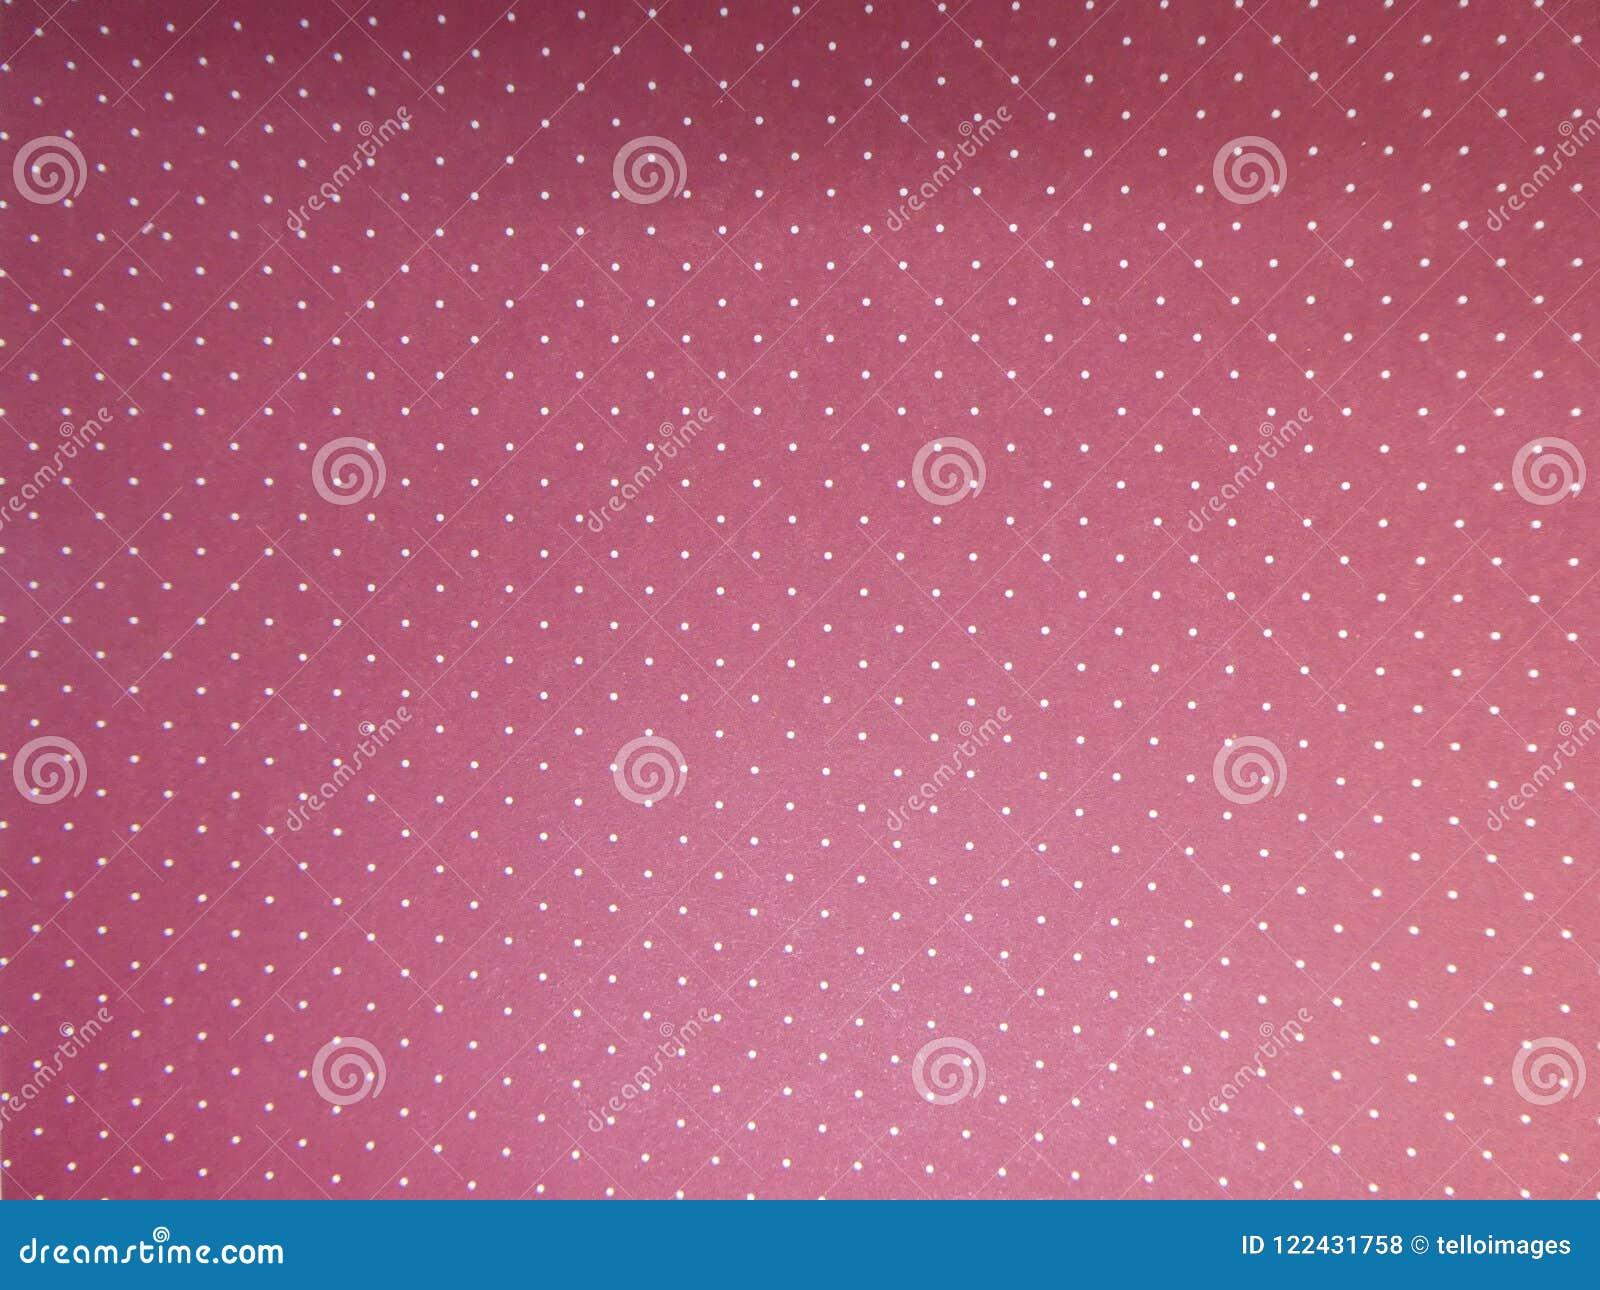 Dark pink with white dots wallpaper background